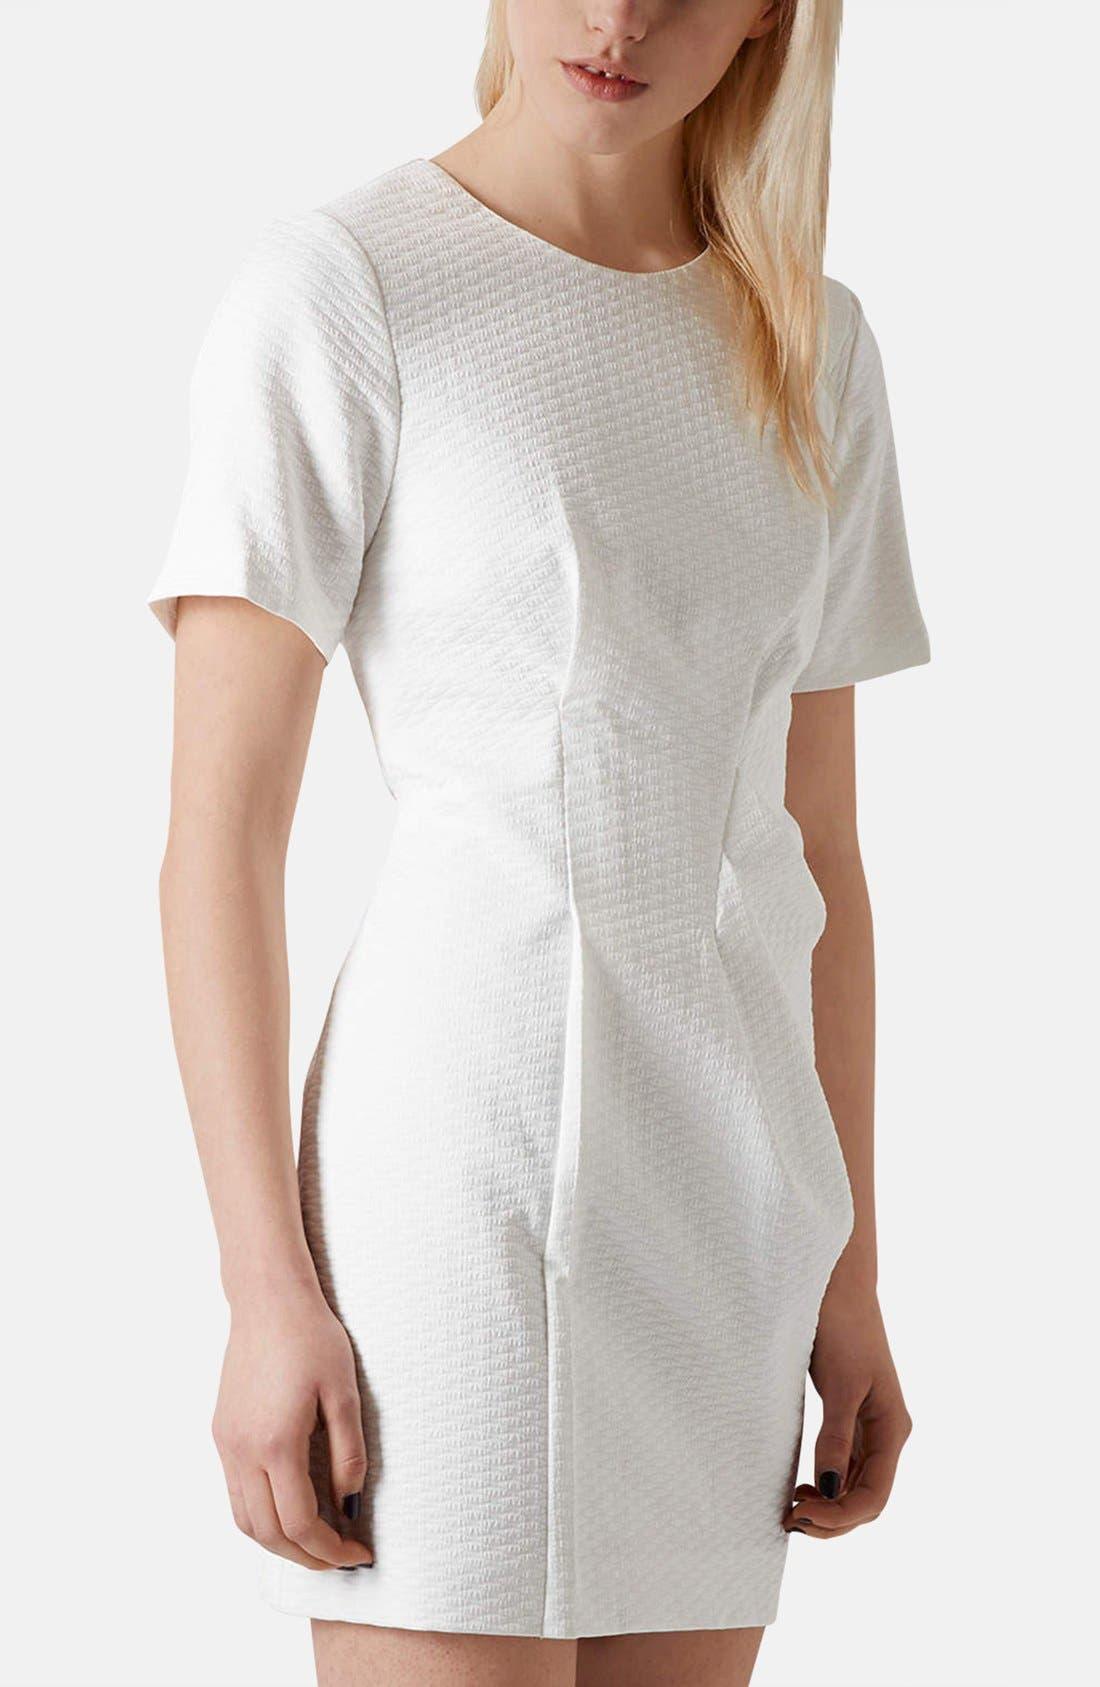 Alternate Image 1 Selected - Topshop 'Premium' Textured Pleat Sheath Dress